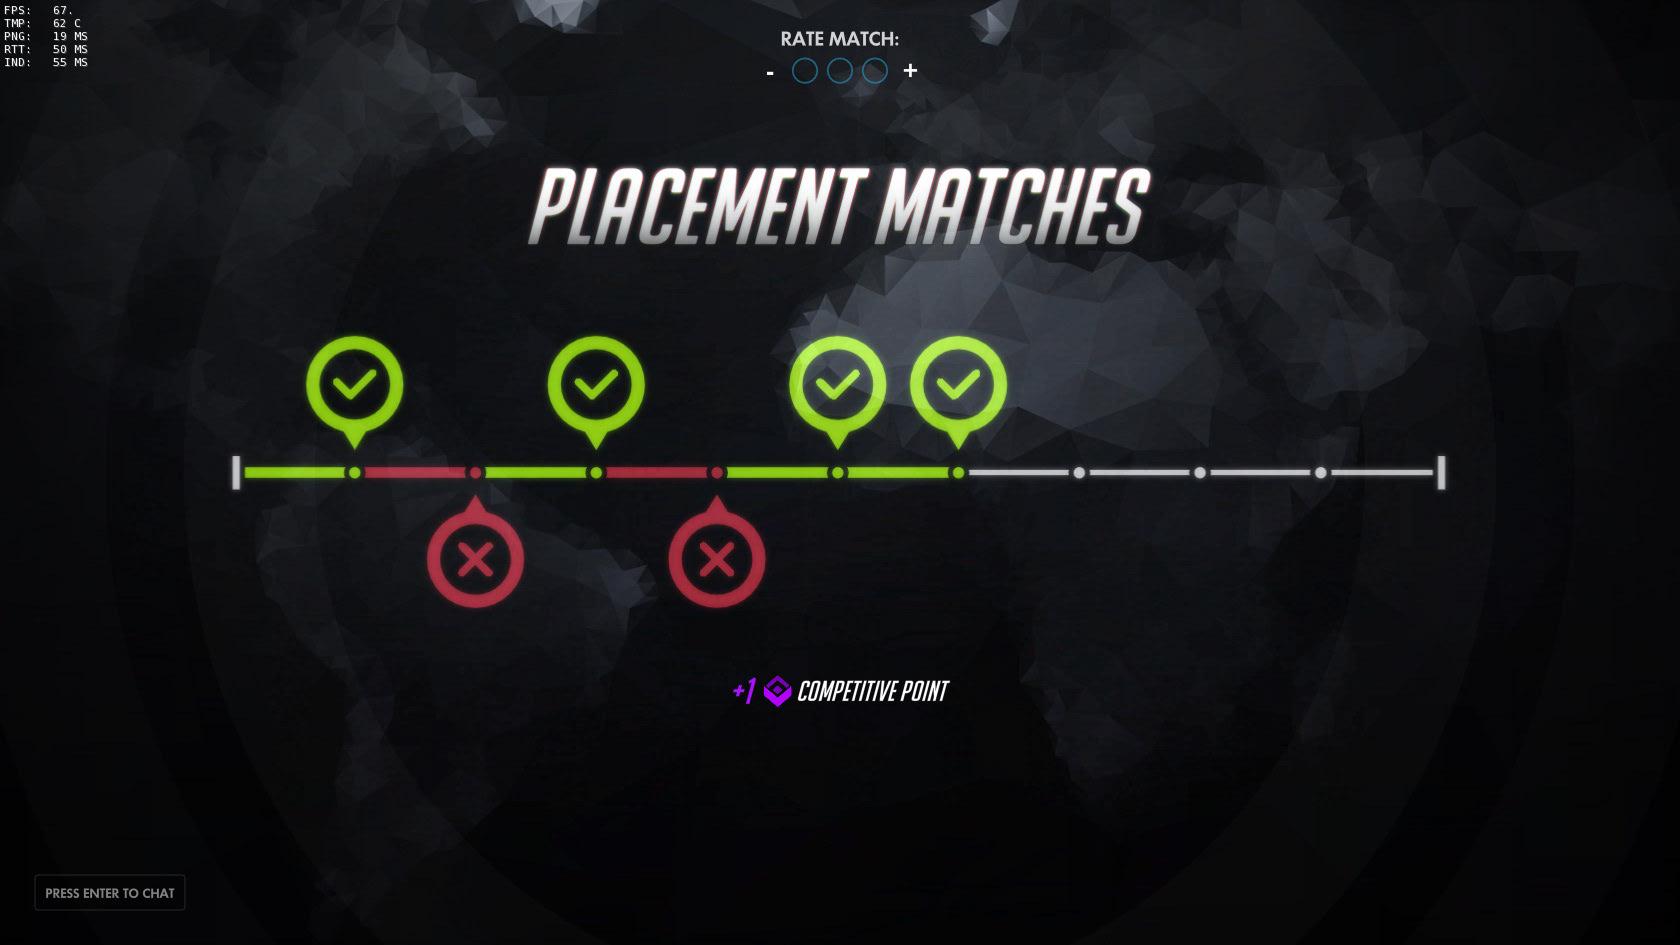 Overwatch Screenshot Placement Matches